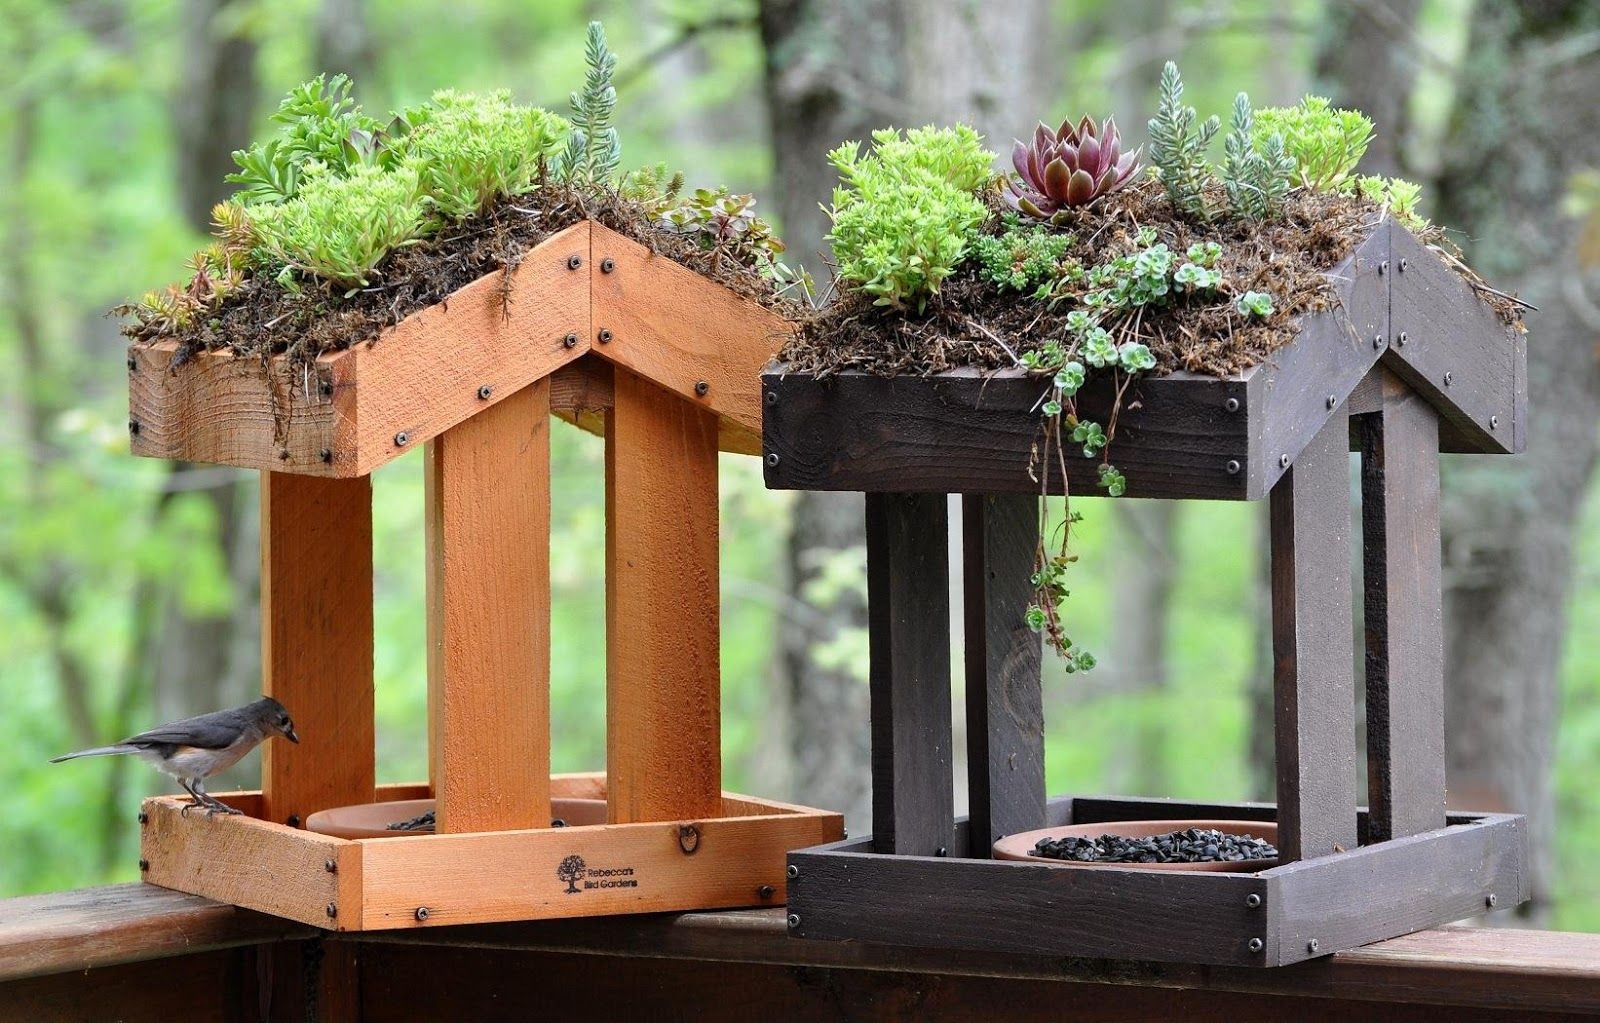 ee913963b721e2faad4a1ccda5659872 - Better Homes And Gardens Bird House